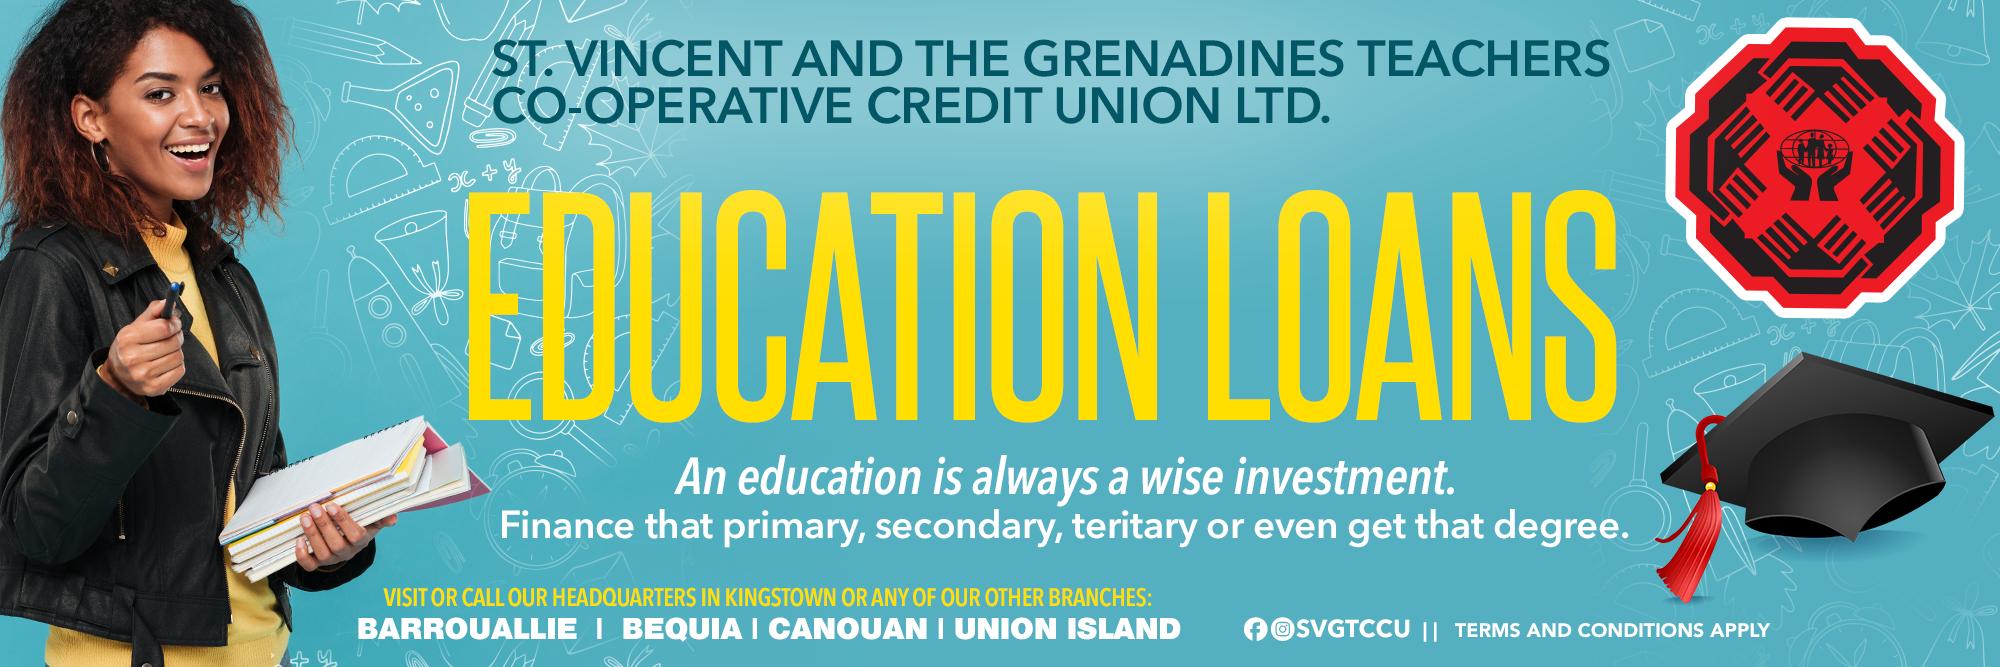 Educational Loans